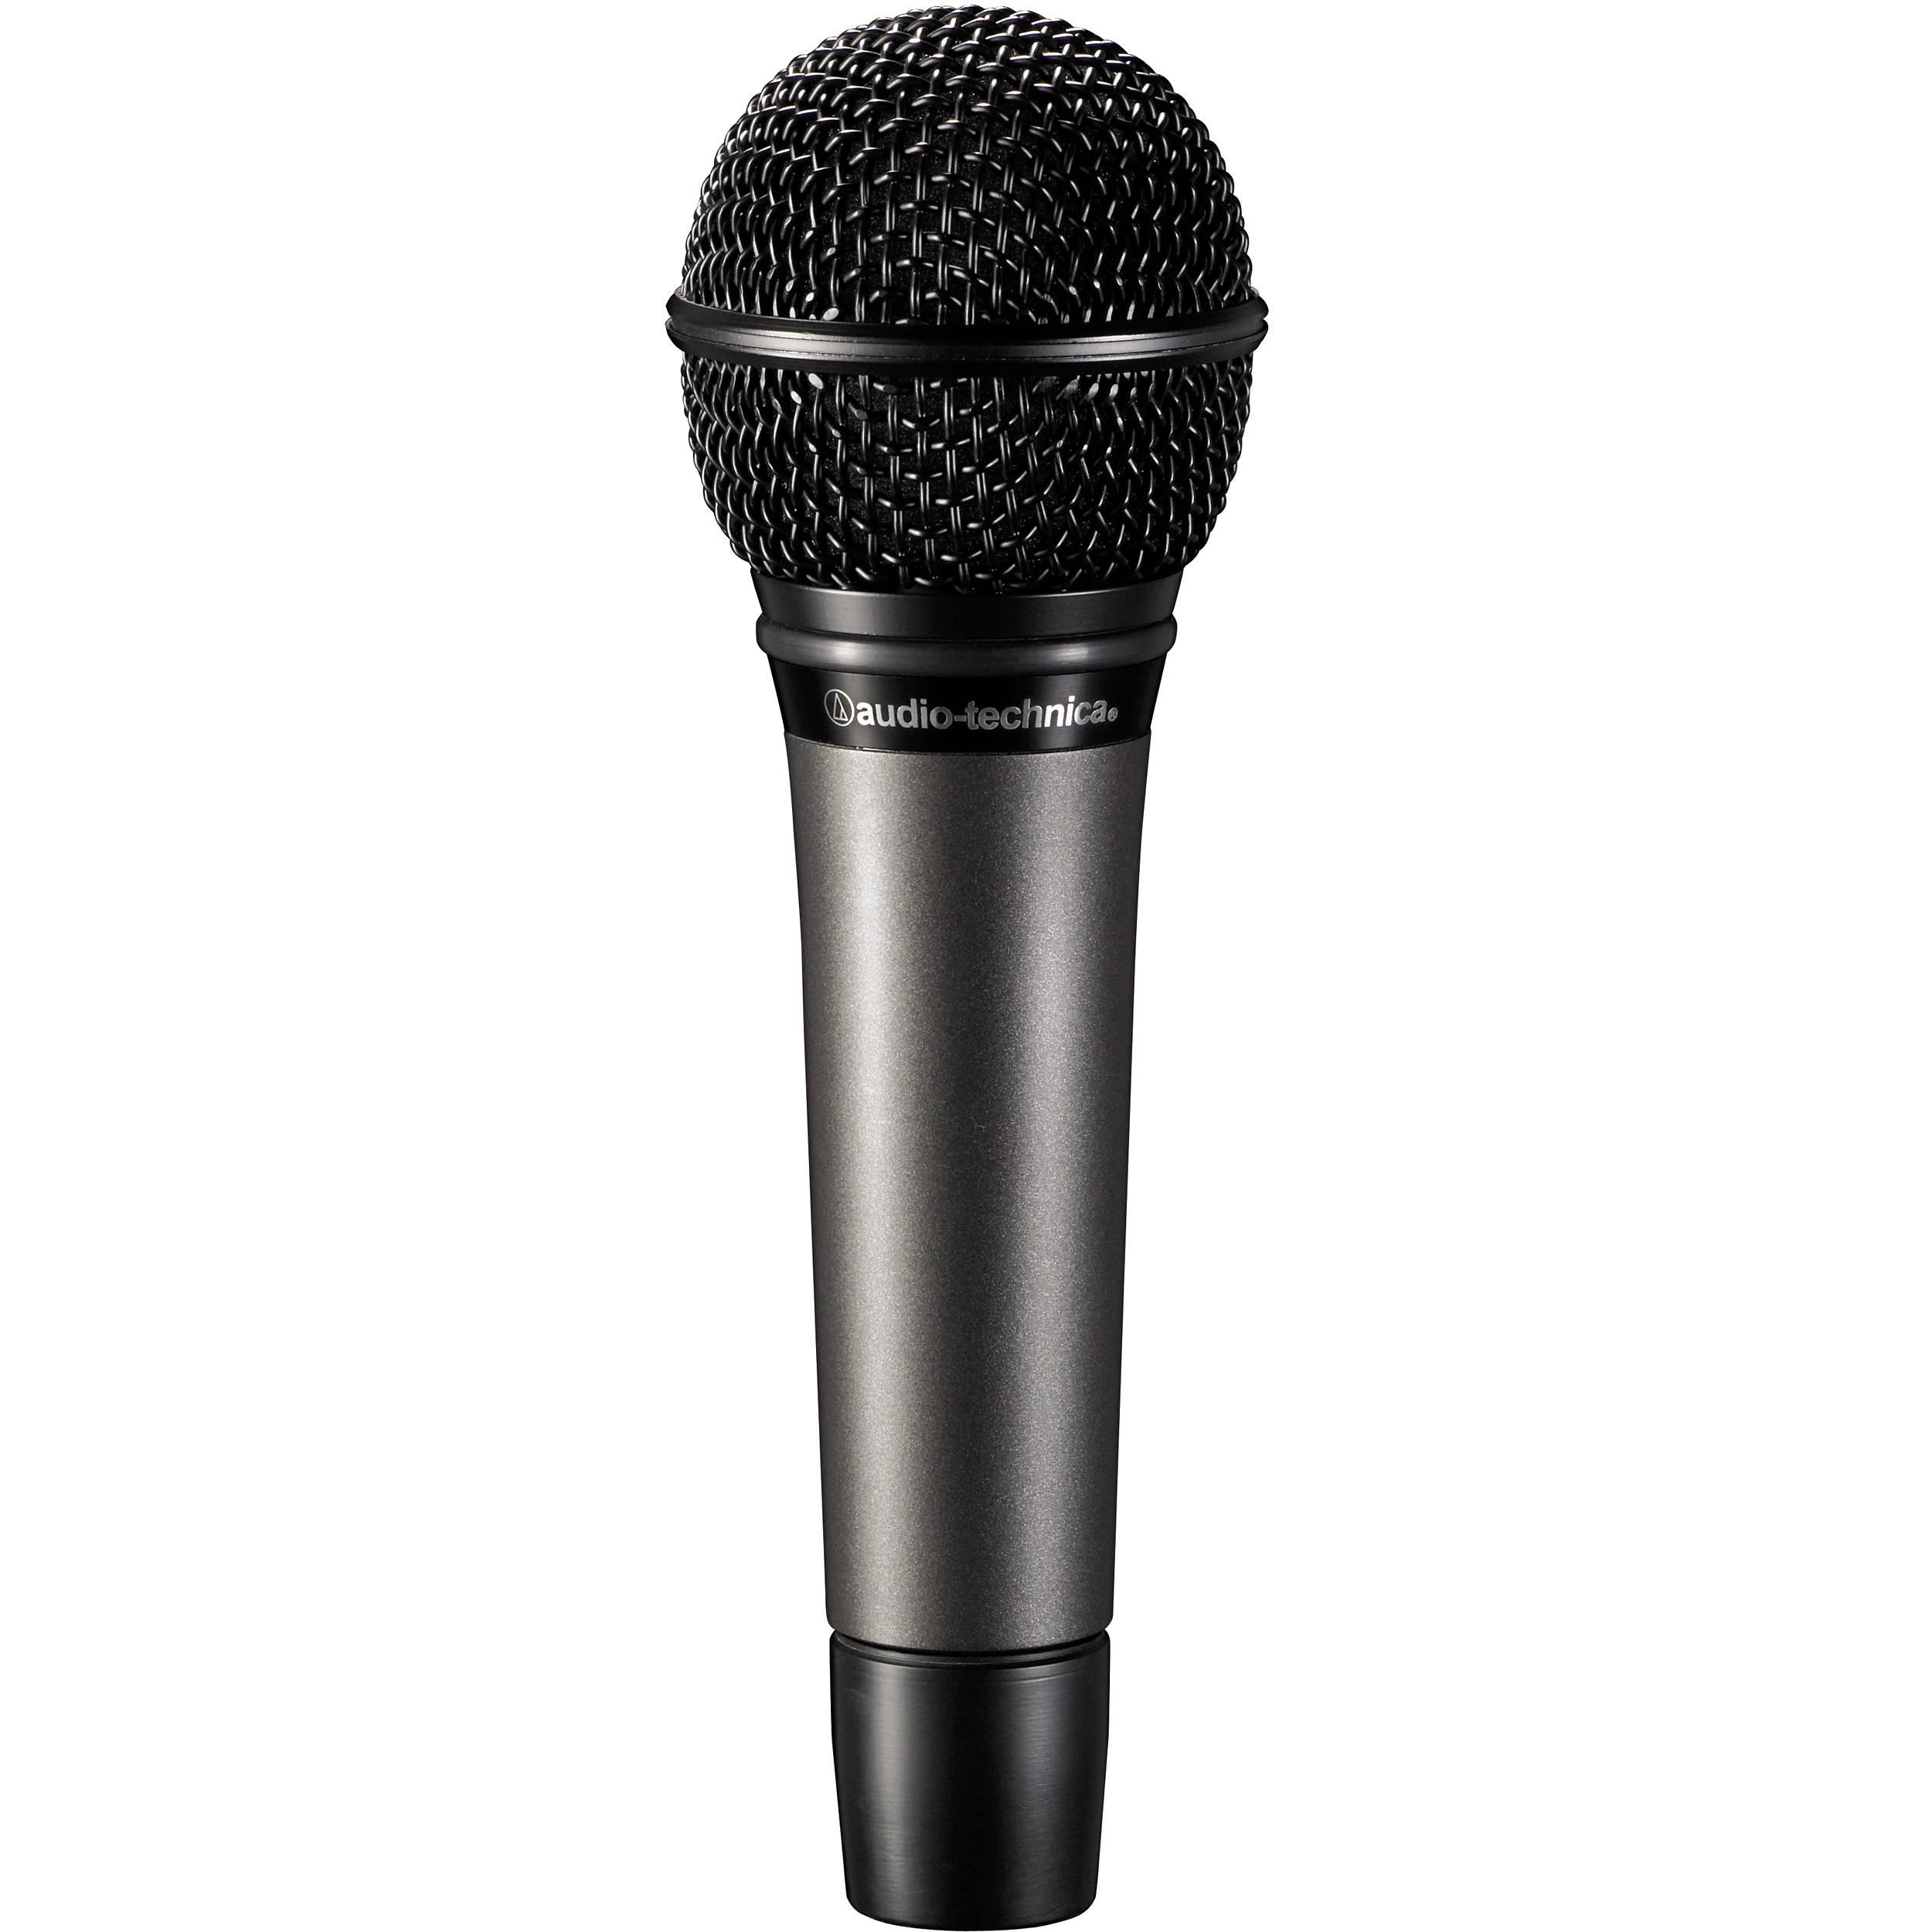 audio technica atm410 vocal microphone atm410 b h photo video. Black Bedroom Furniture Sets. Home Design Ideas